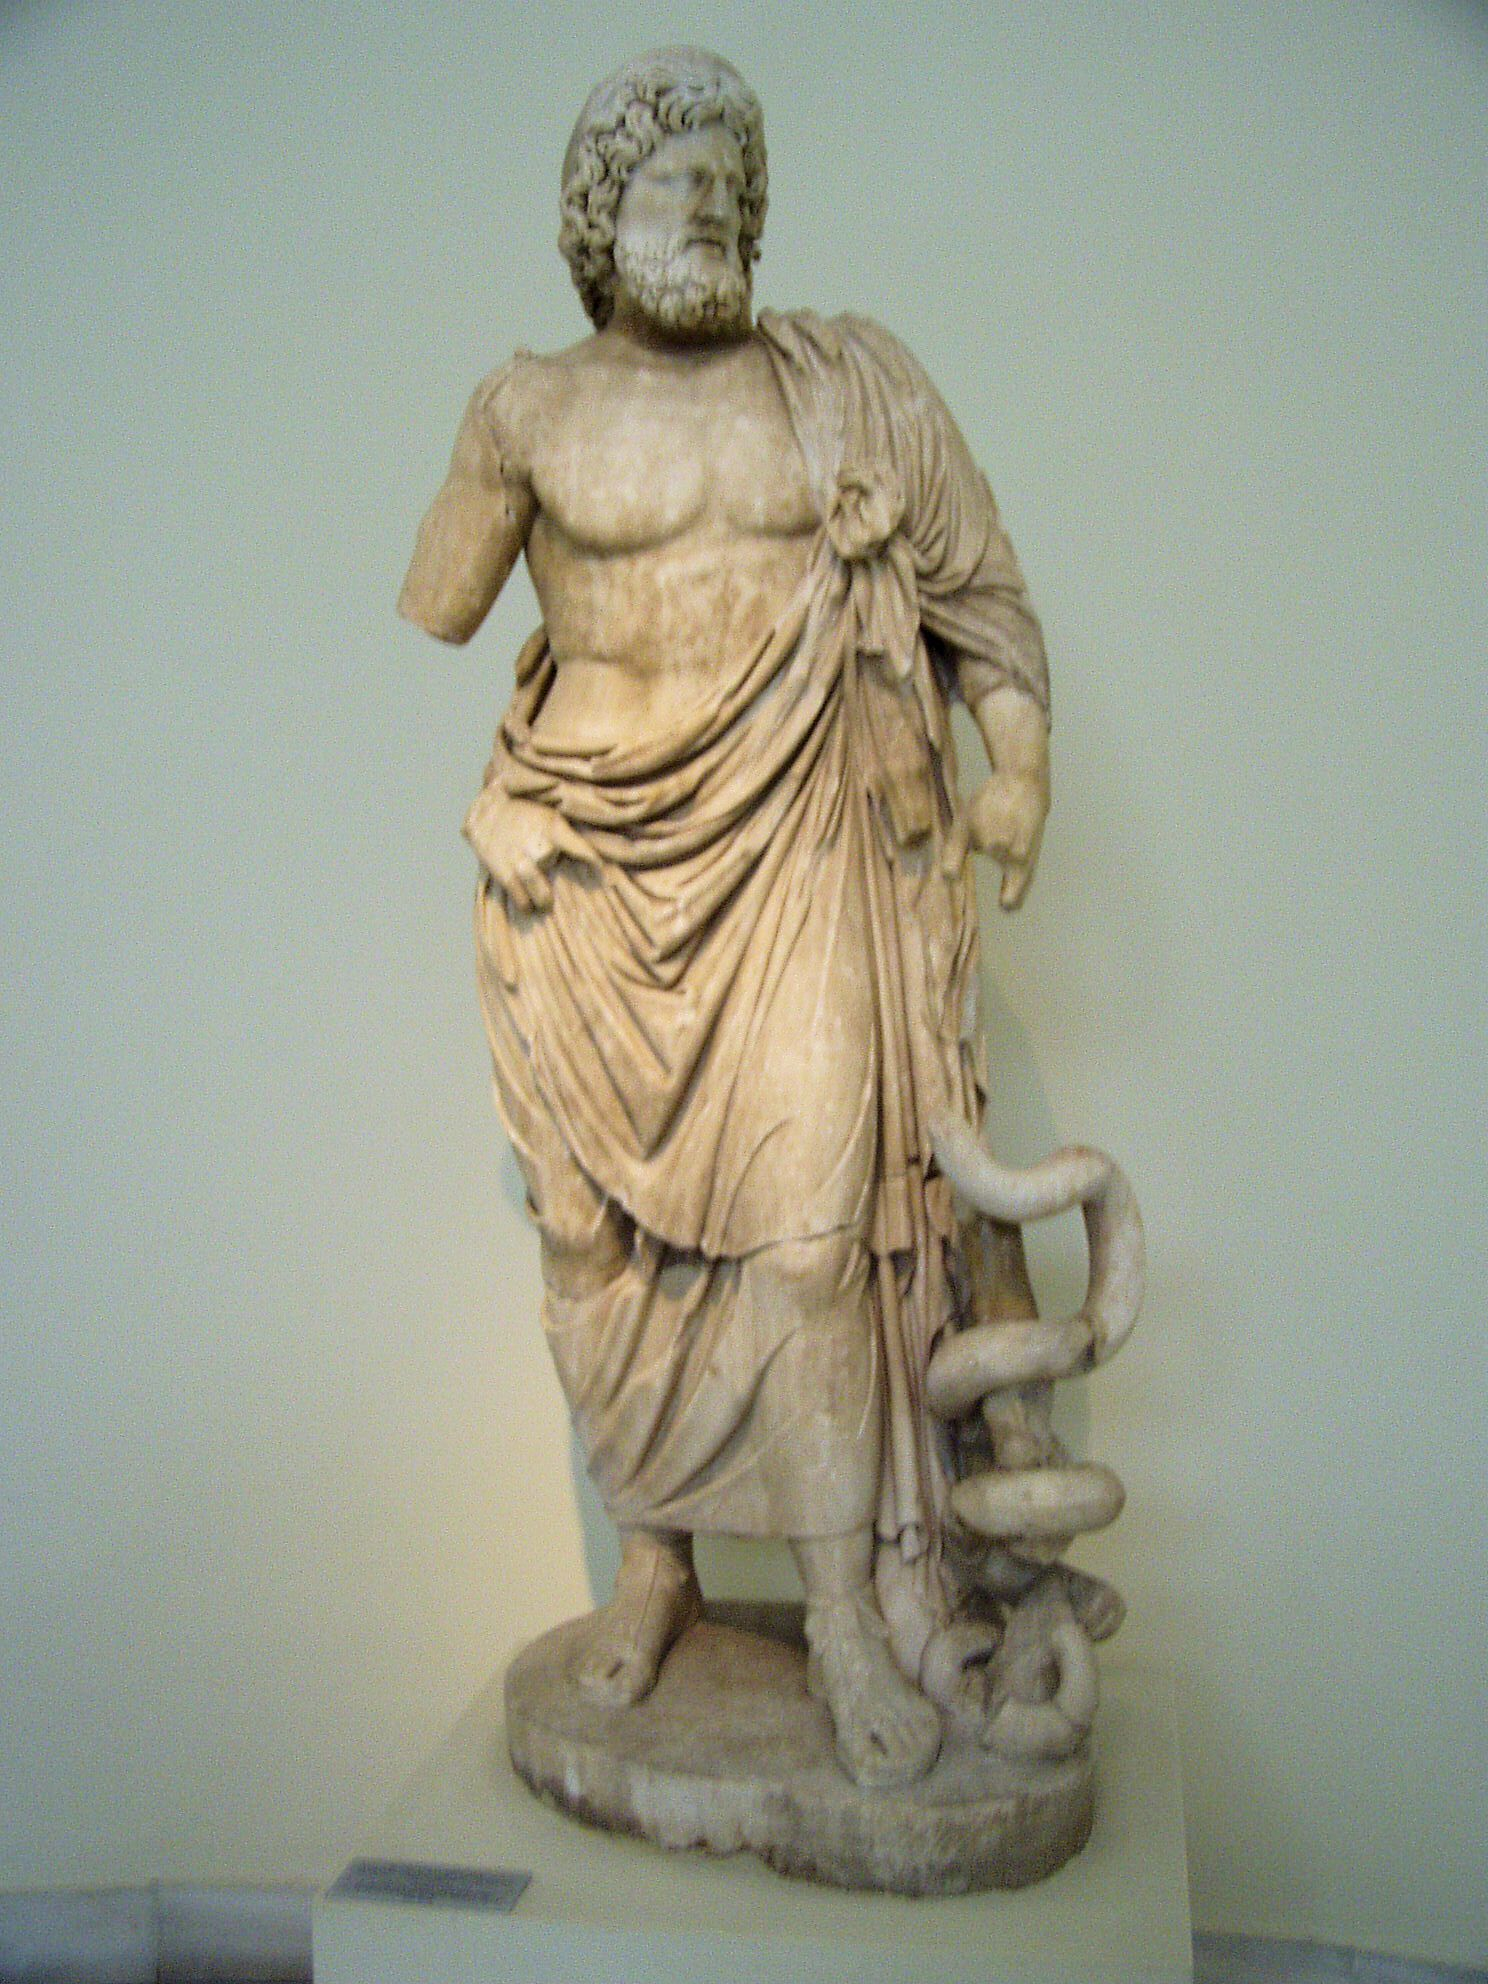 Greek Mythology Gods Sculpture Statue Of Asclepius The Greek - Greek religion